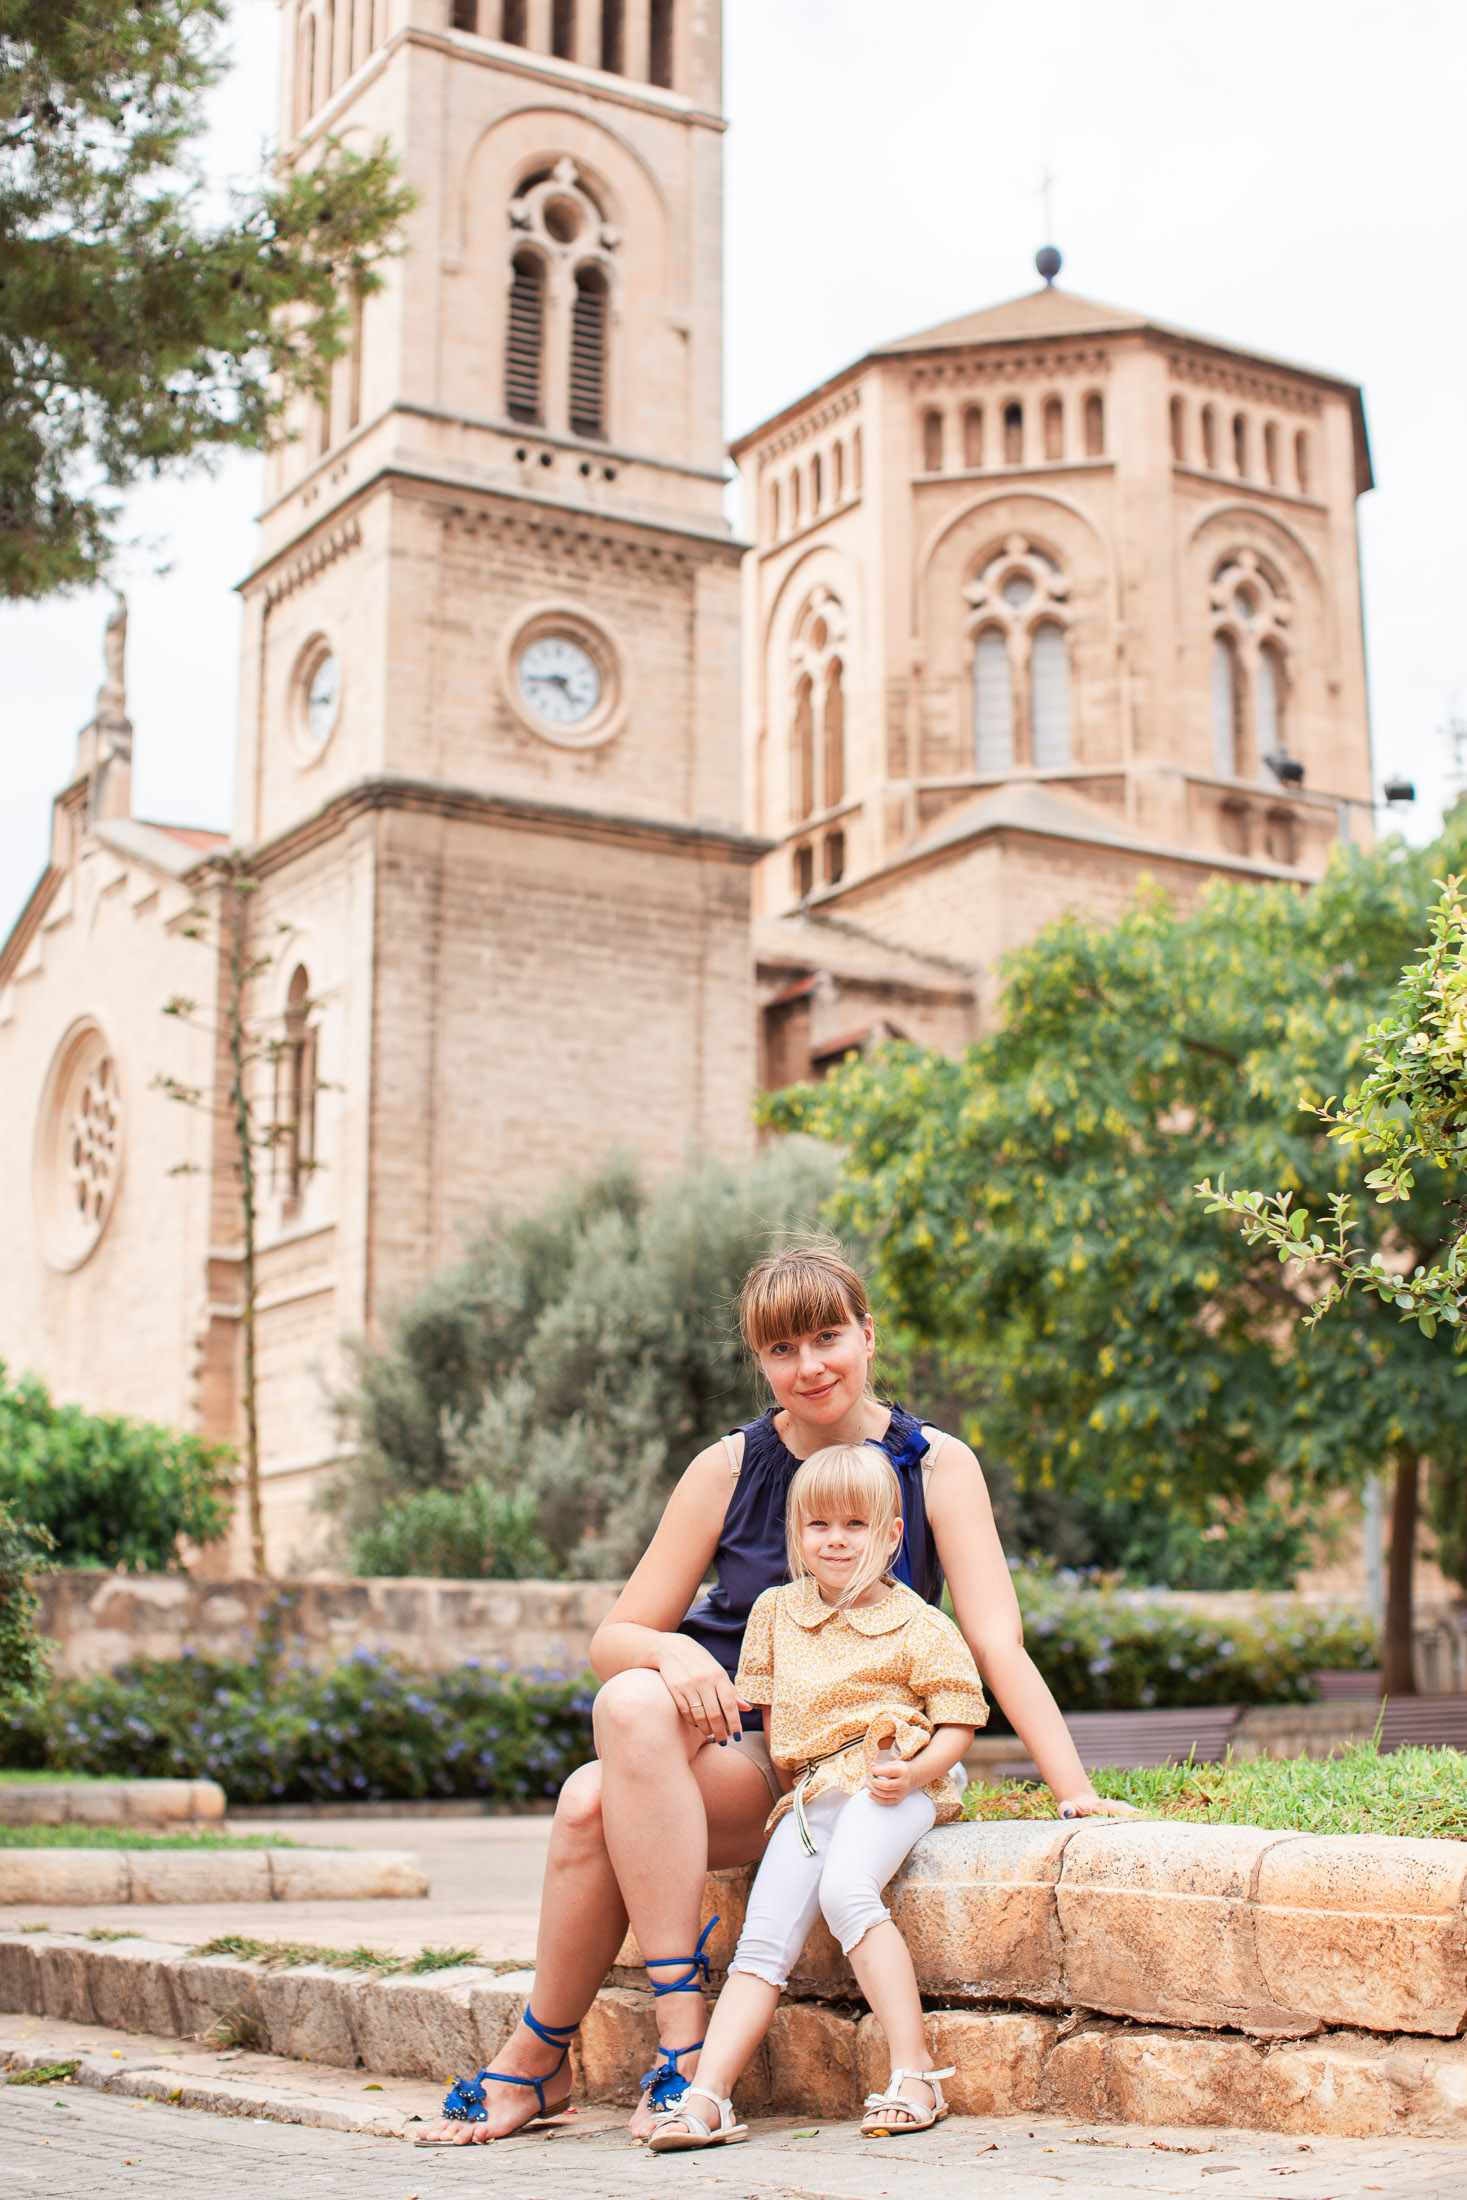 Photographer in Malaga